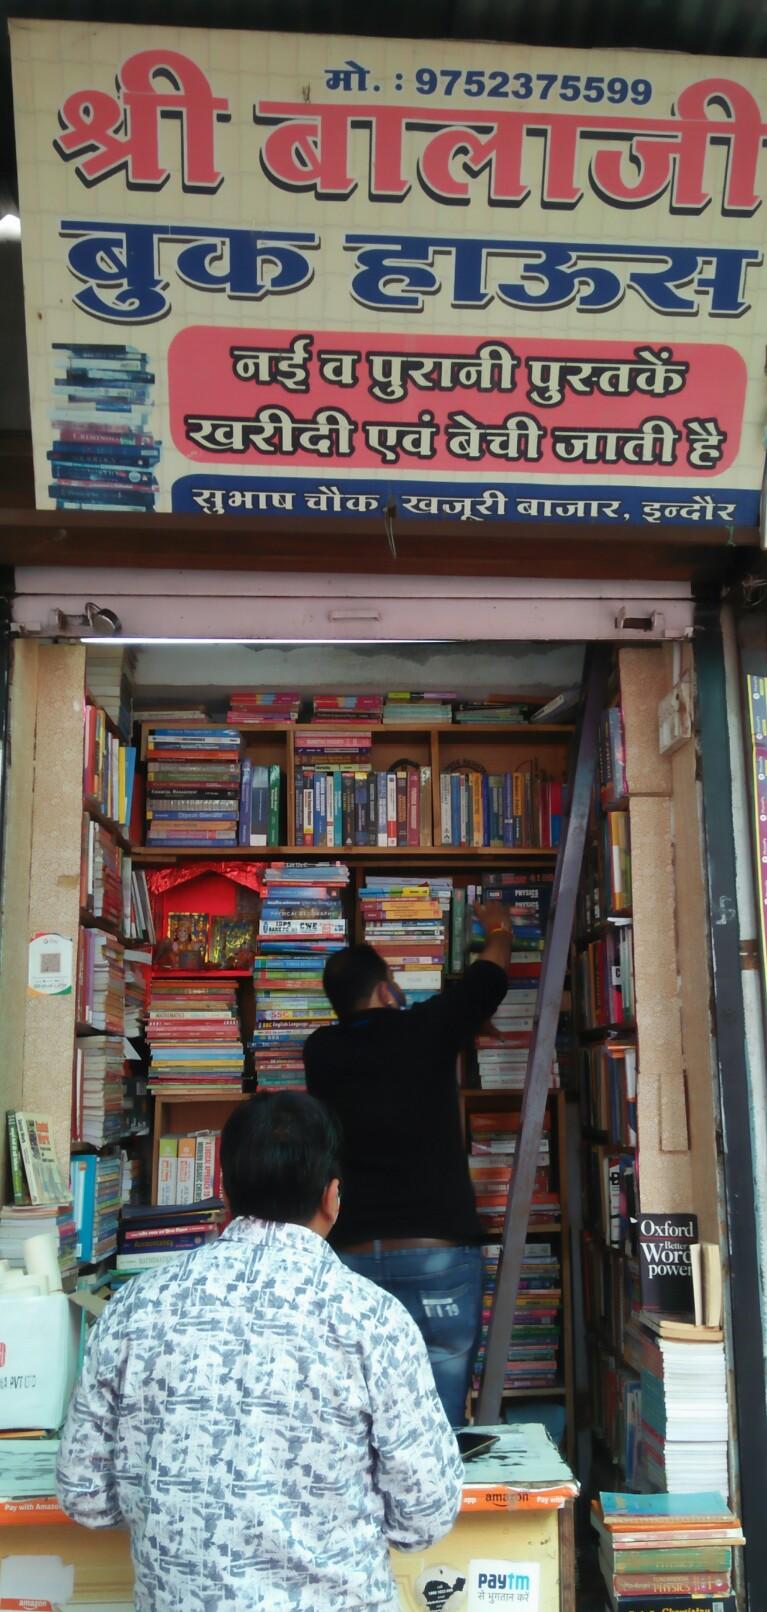 Shree balaji book house